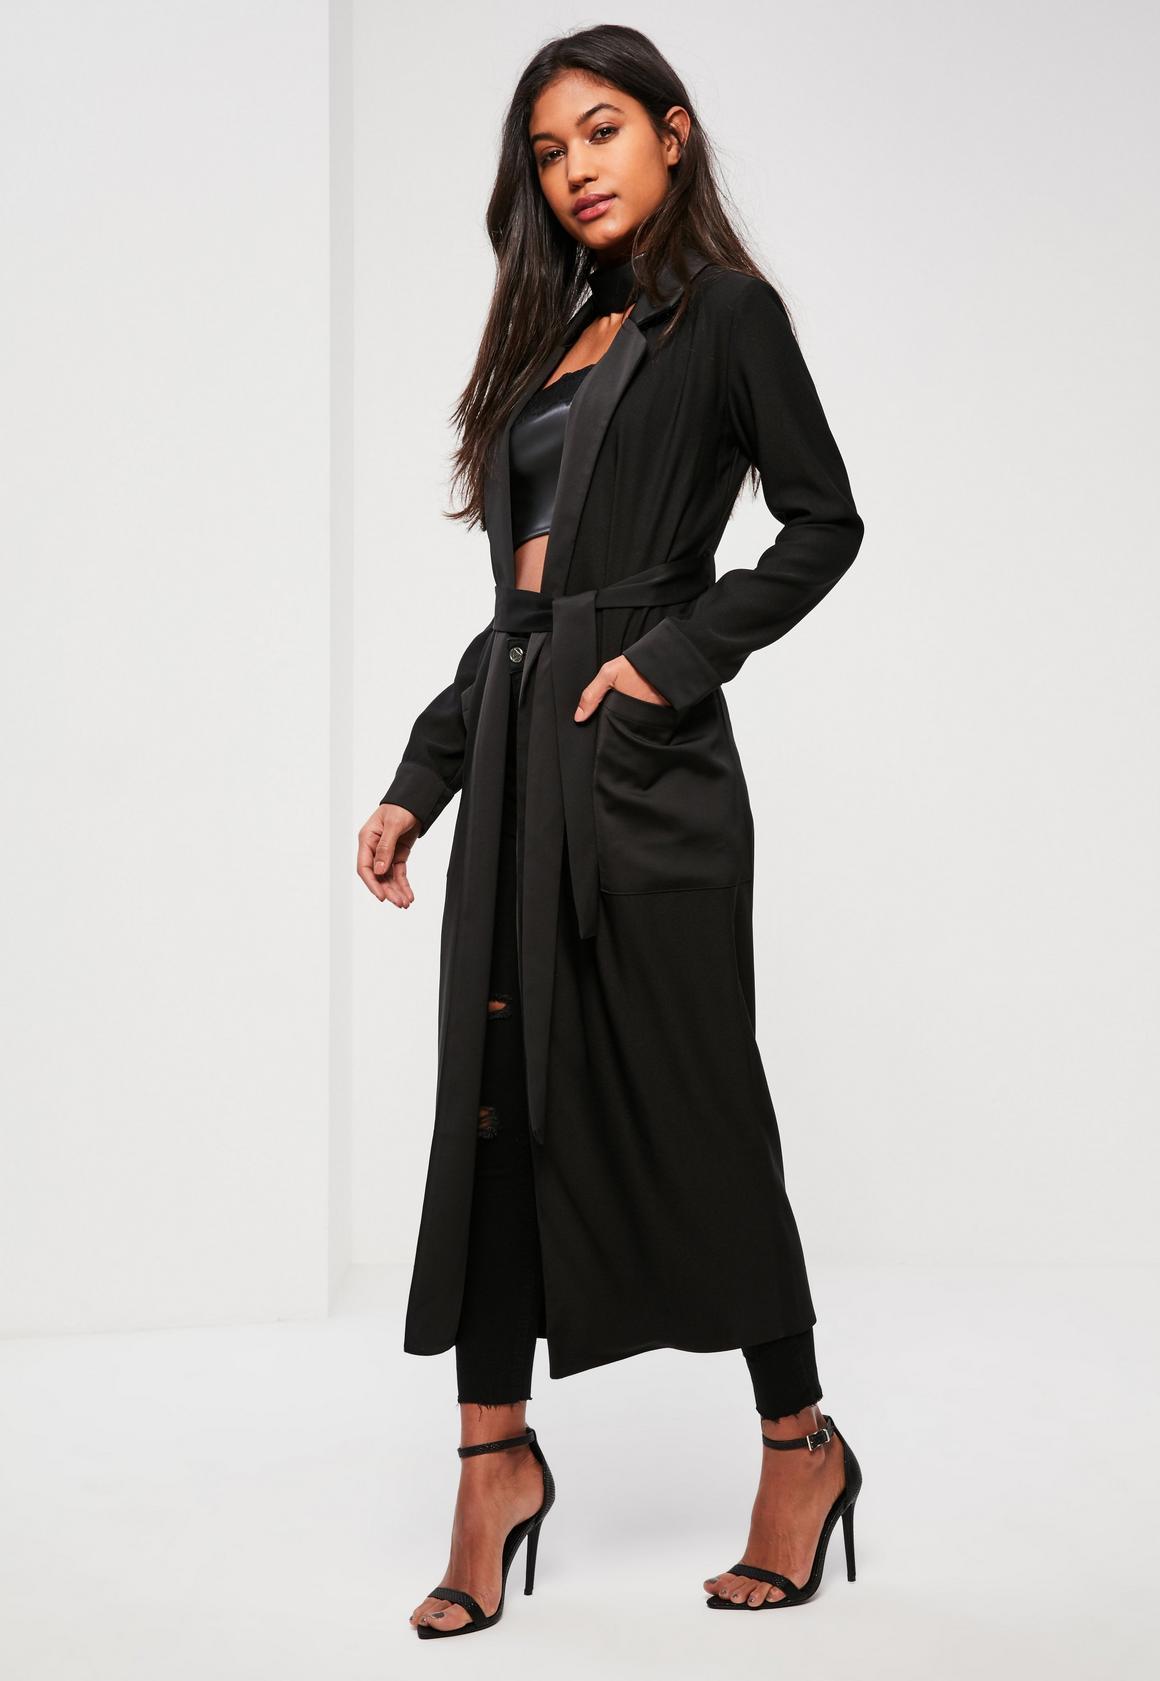 Black Satin Pocket Detail Duster Coat | Missguided